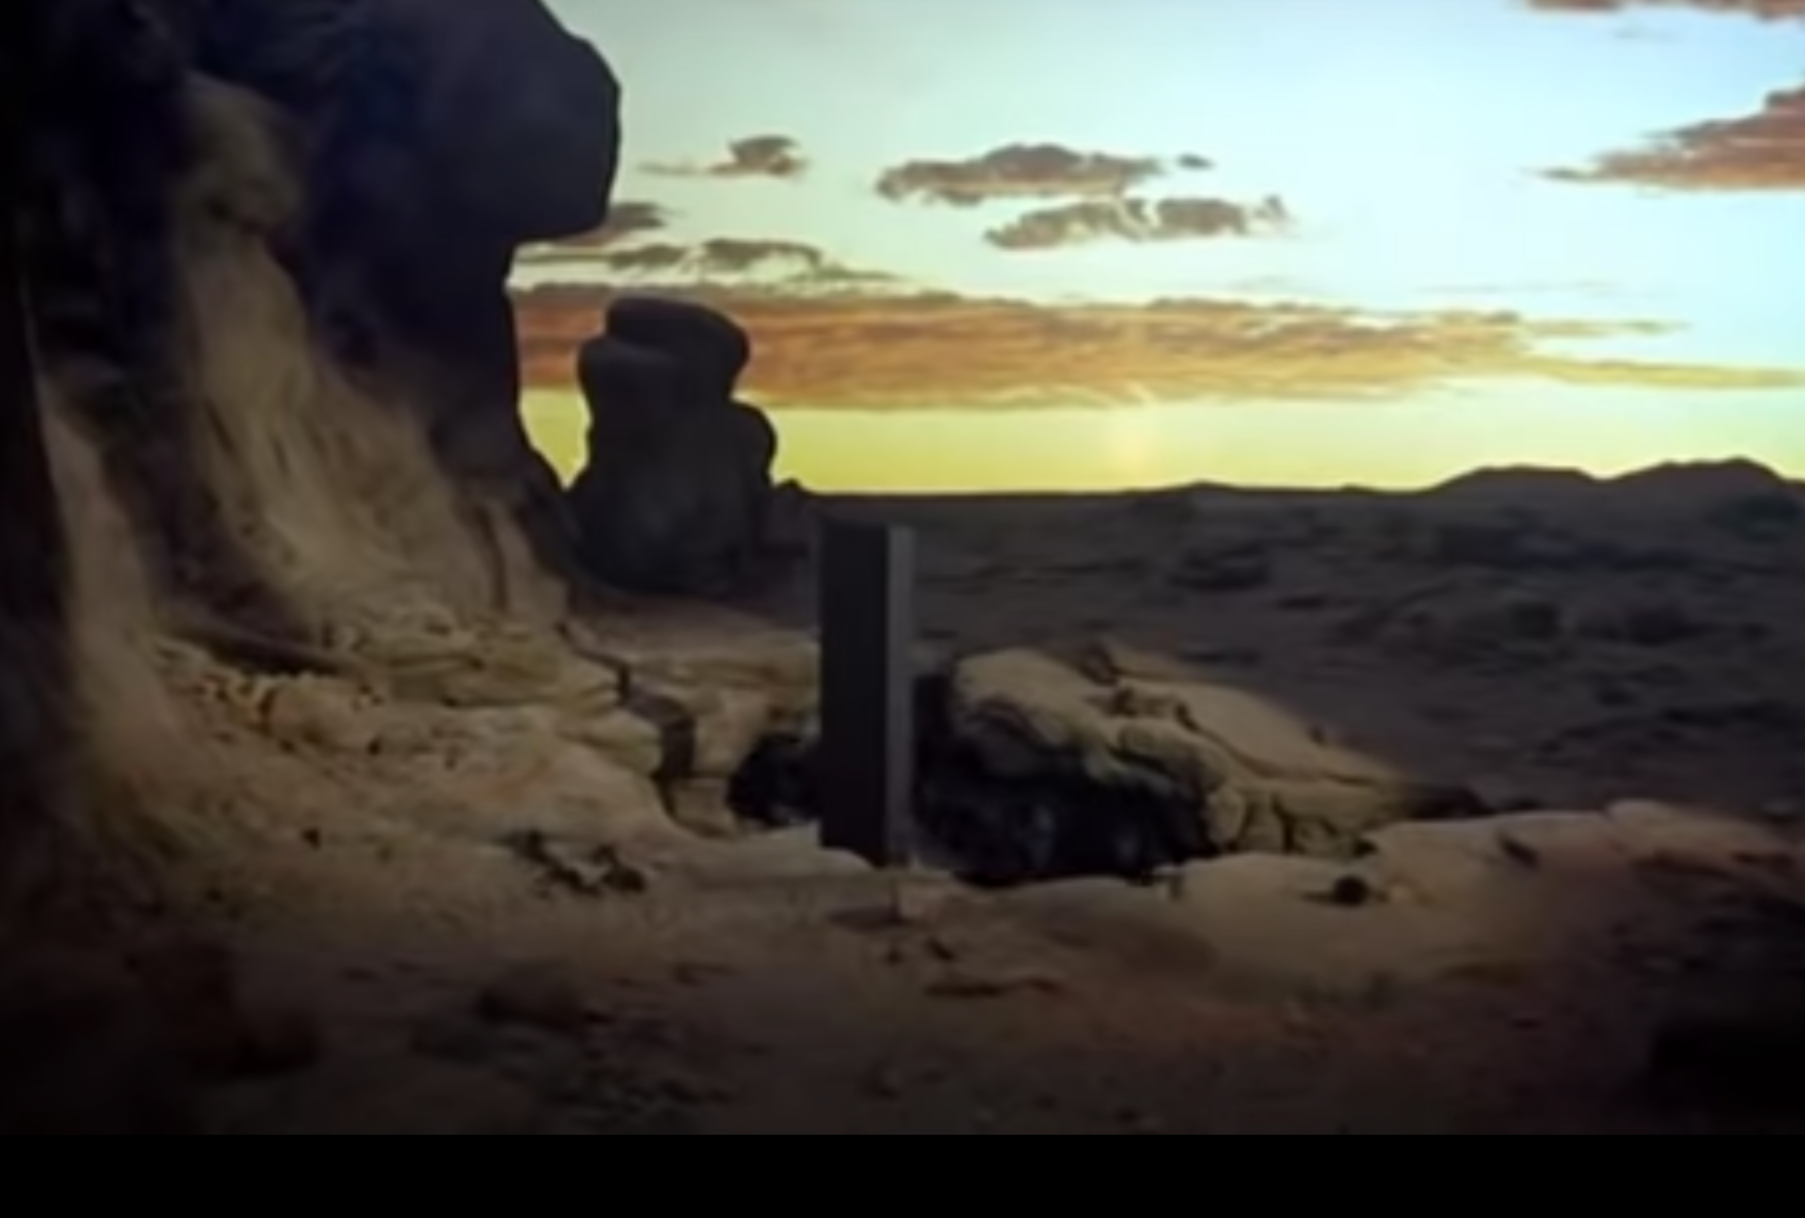 zpaihjznlwvm8m https www salon com 2020 11 24 monolith discovered in utah desert has everyone buzzing over 2001 a space odyssey partner